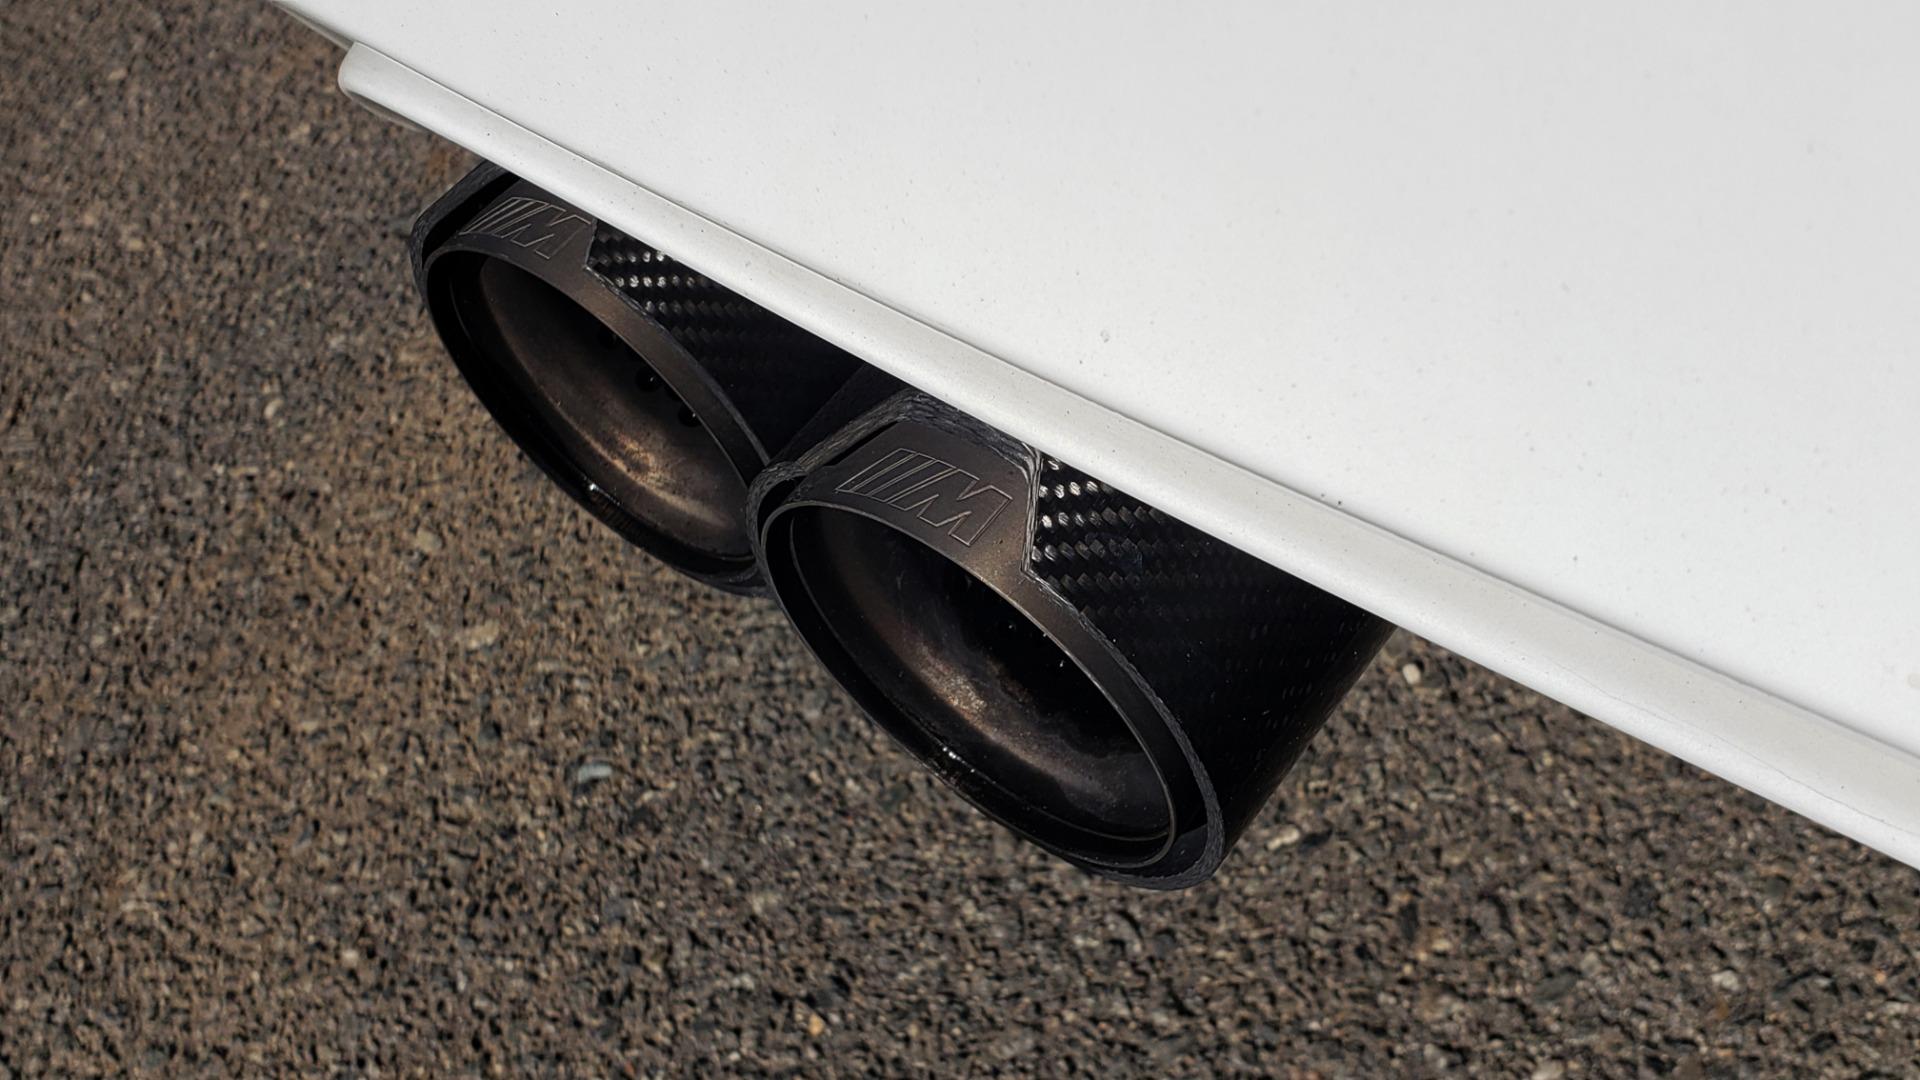 Used 2018 BMW M4 COMP PKG / EXEC / M-DRIVER / PARK CNTRL / ACTIVE BLIND SPOT for sale Sold at Formula Imports in Charlotte NC 28227 26